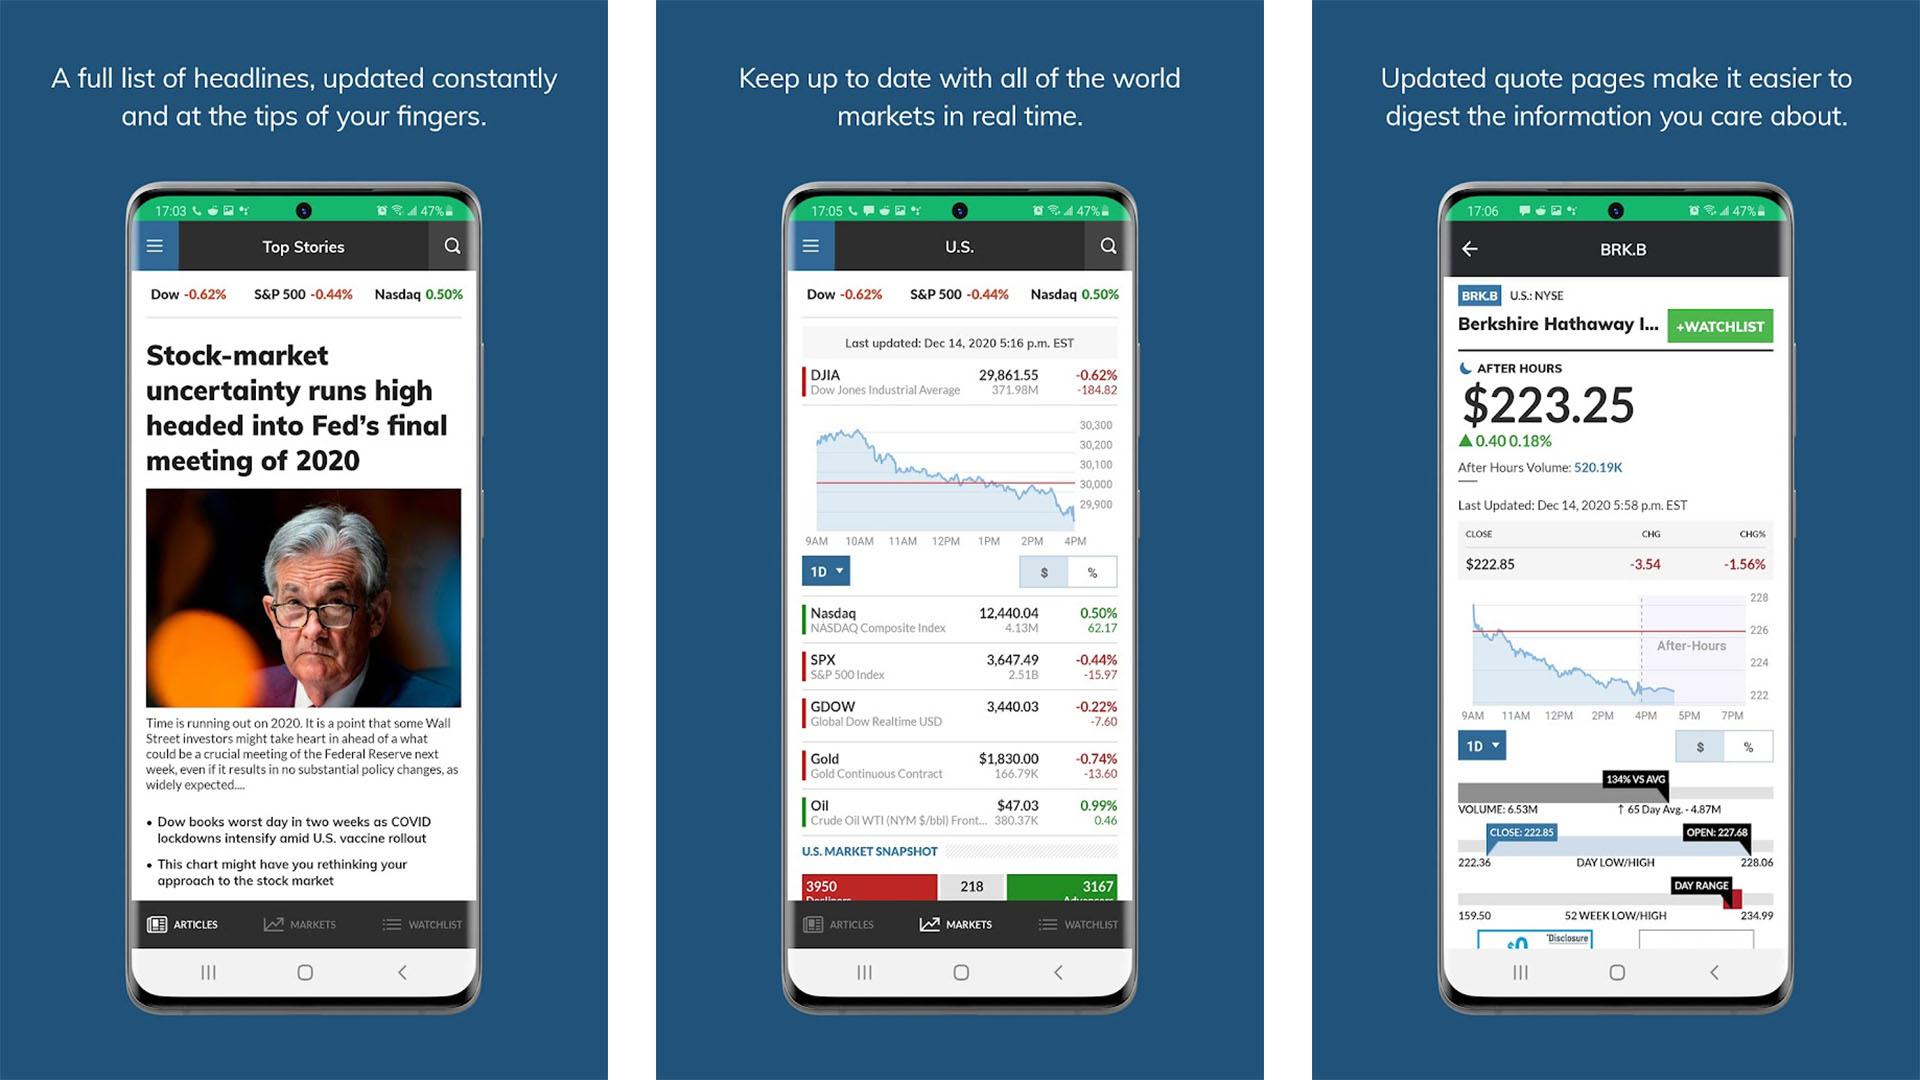 Marketwatch screenshot 2021